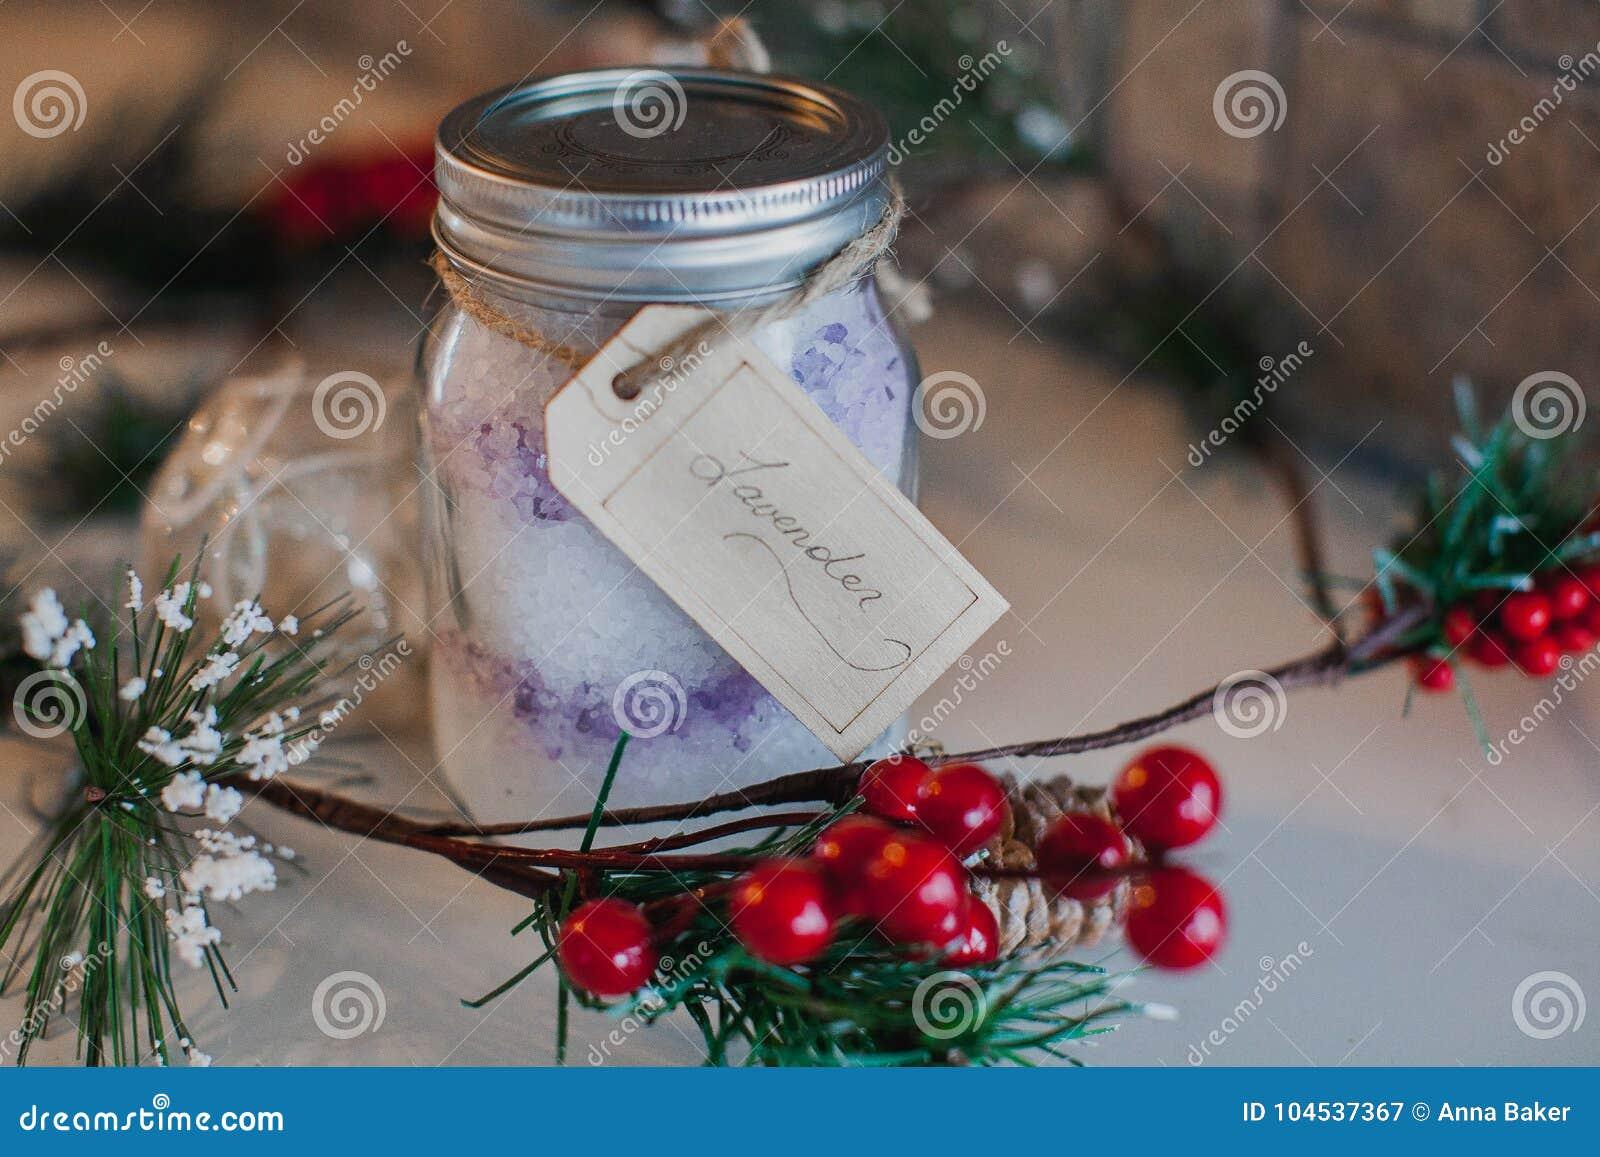 Christmas Mason Jar filled with Epsom Salt